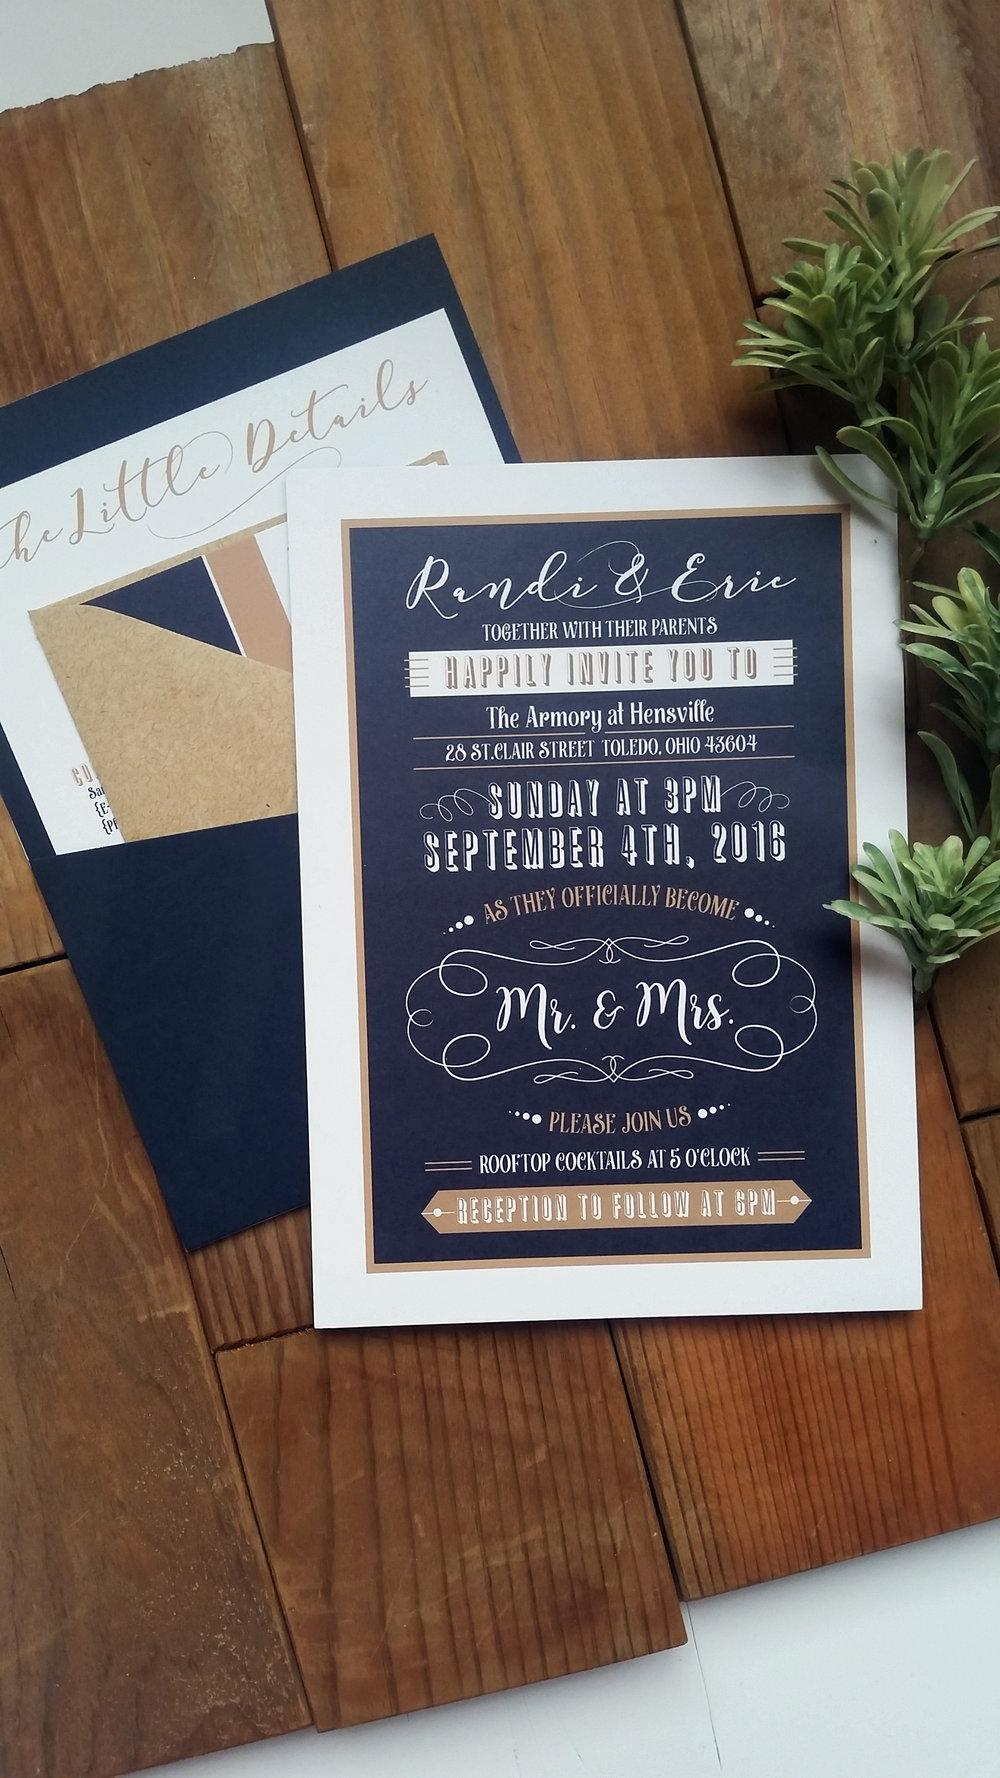 Mr. & Mrs. Wedding Invitation_2.jpg